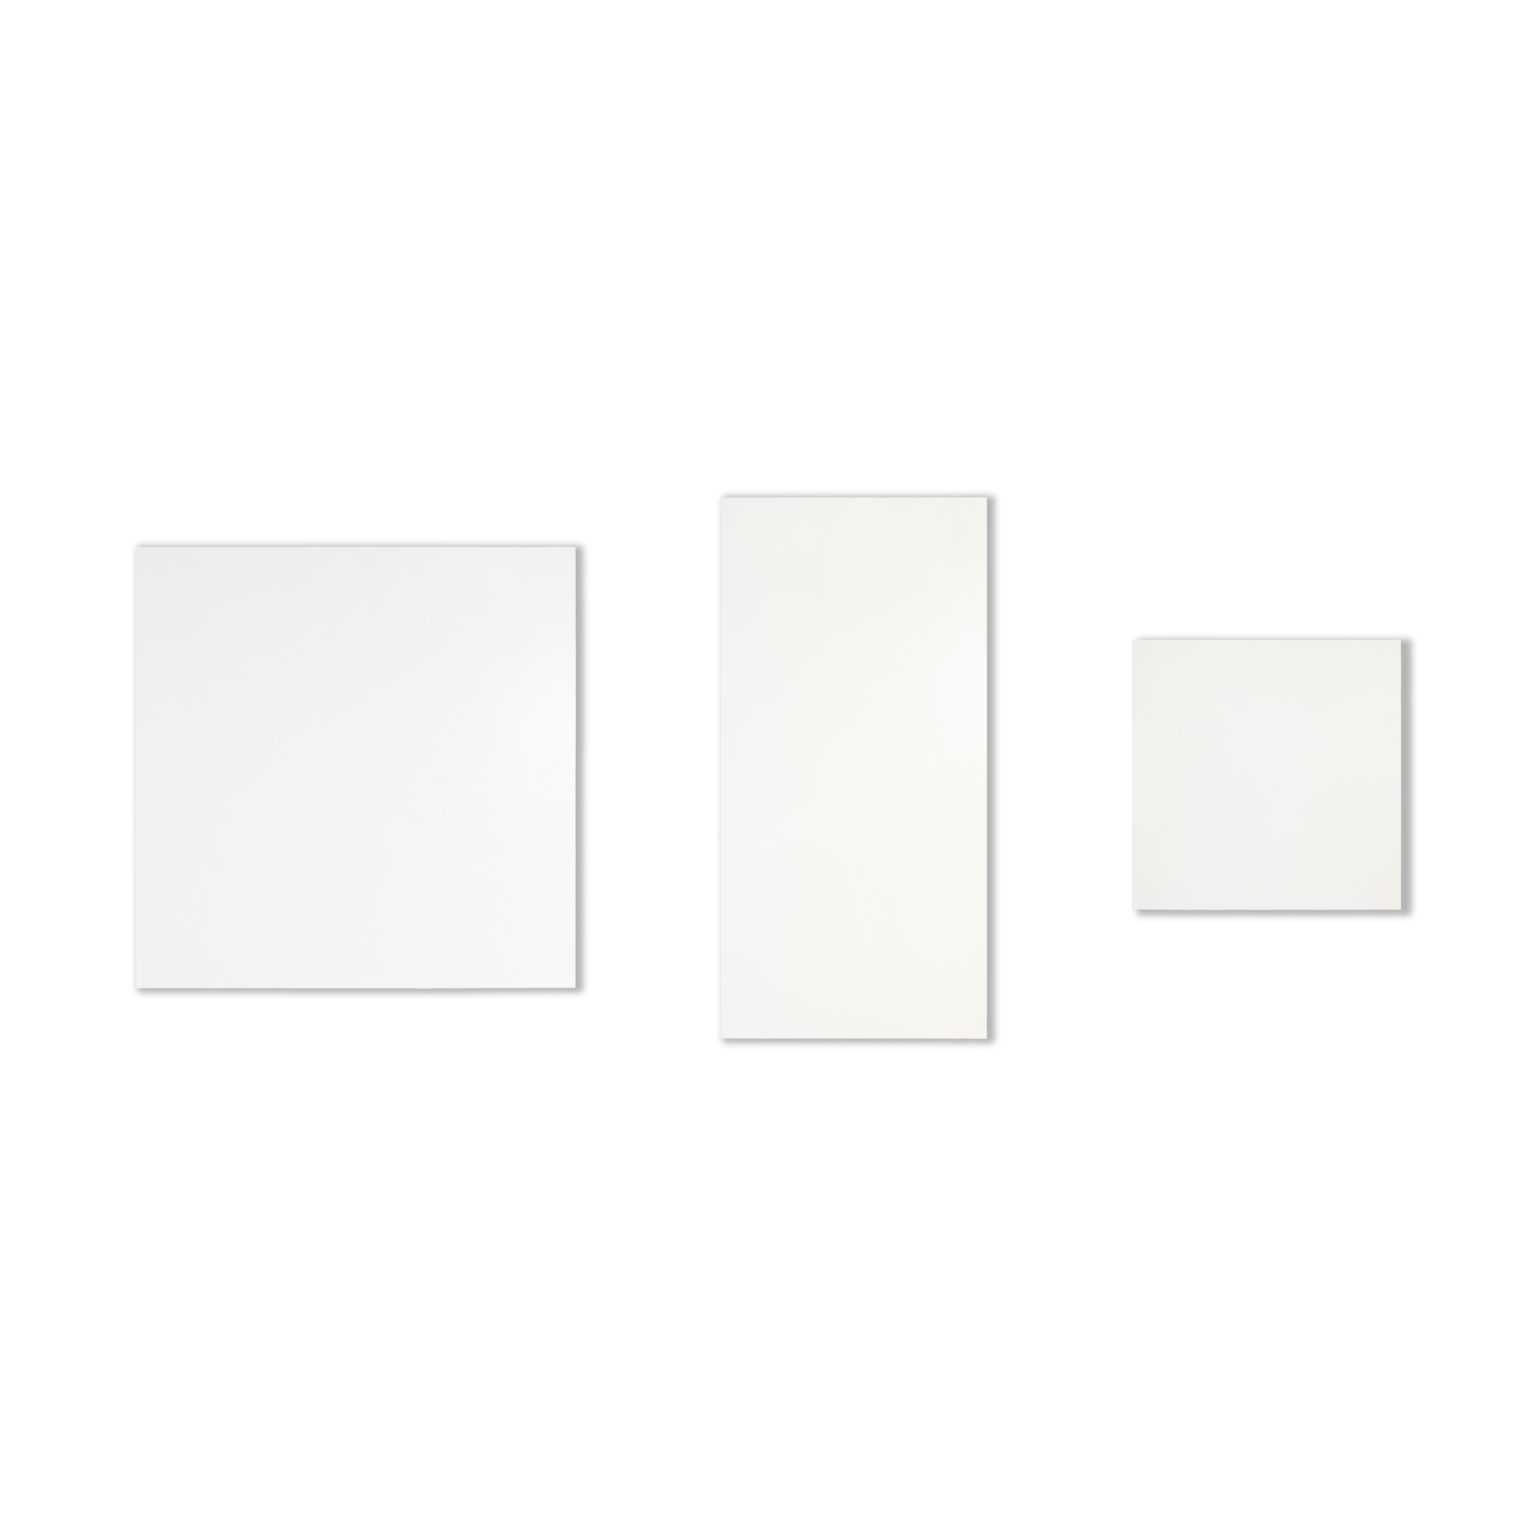 SI Series Aluminum Far Infrared Panels